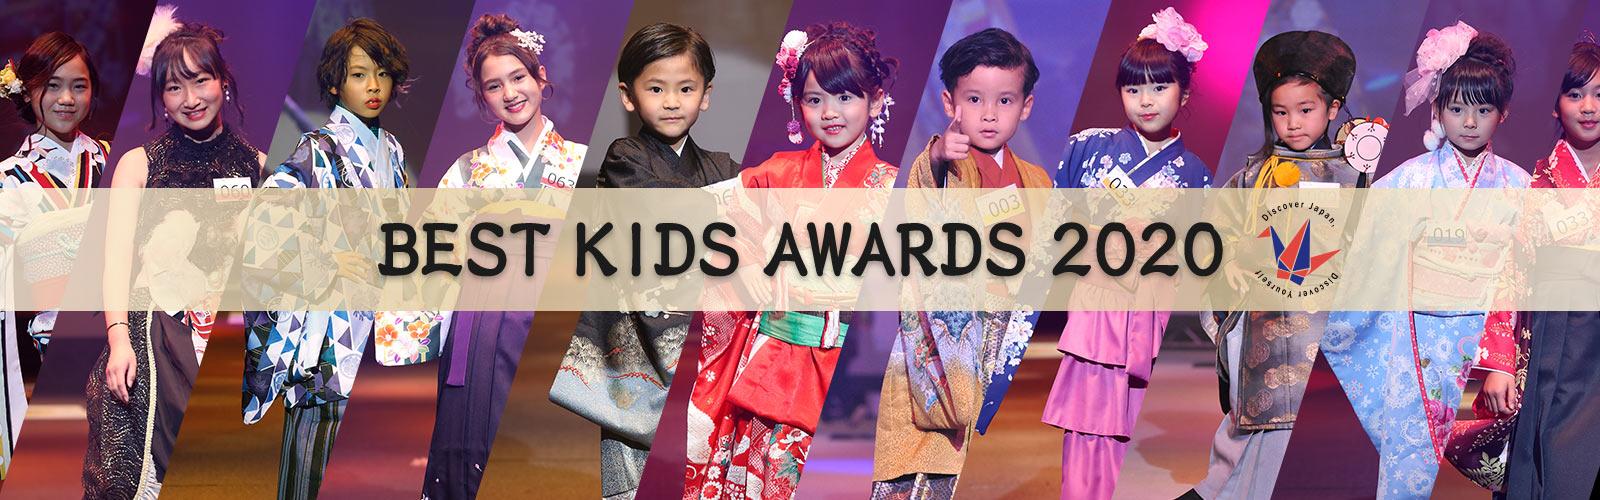 BEST KIDS AWARDS 2020